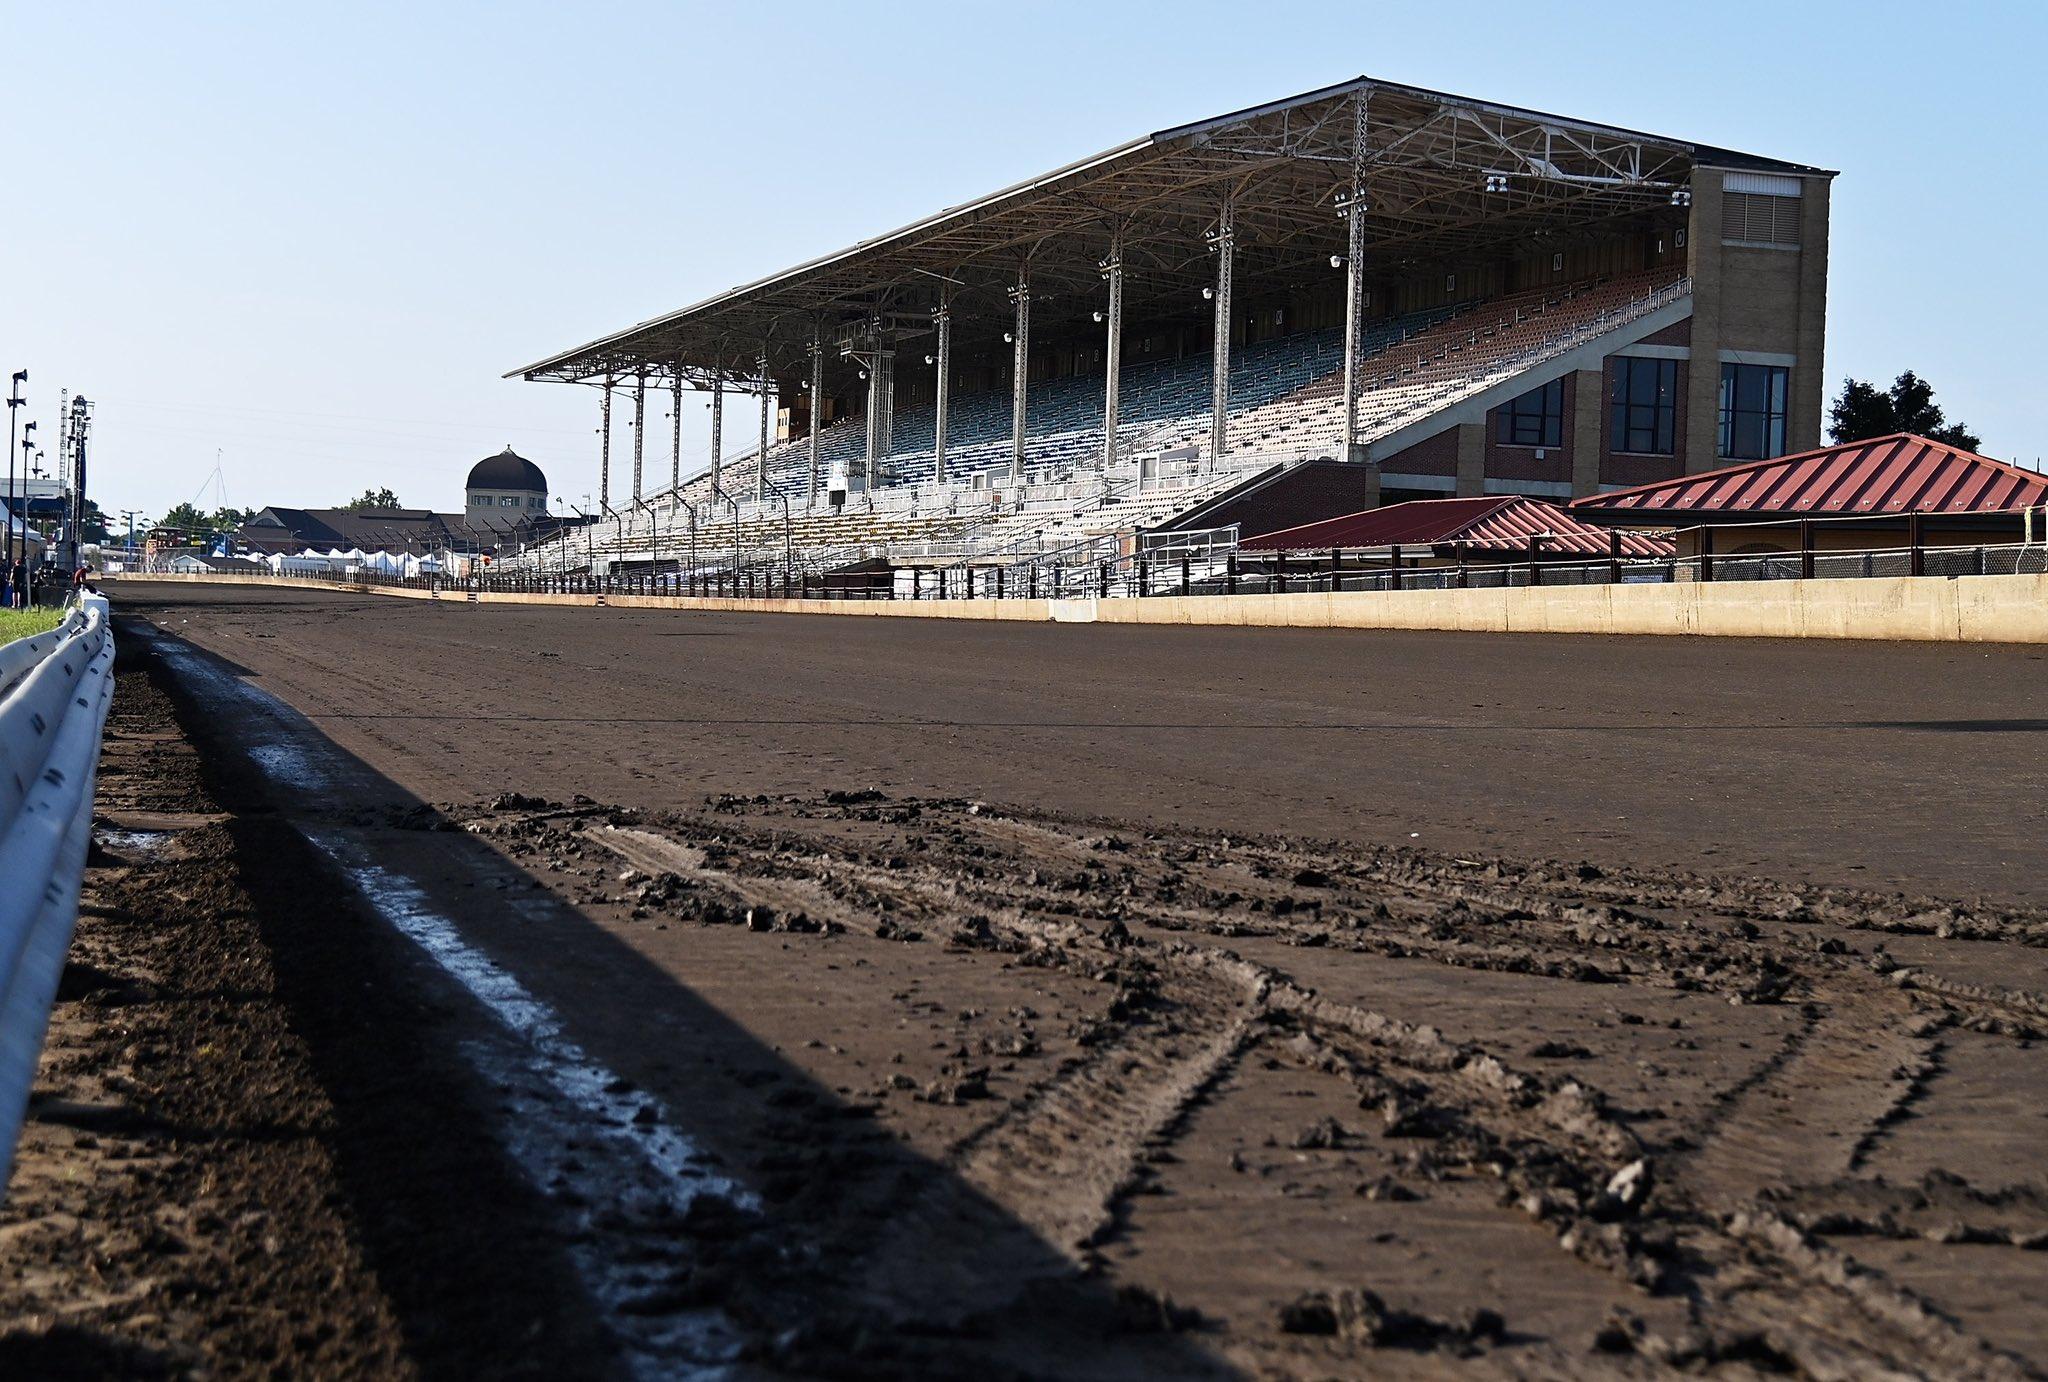 Springfield Mile Dirt Track